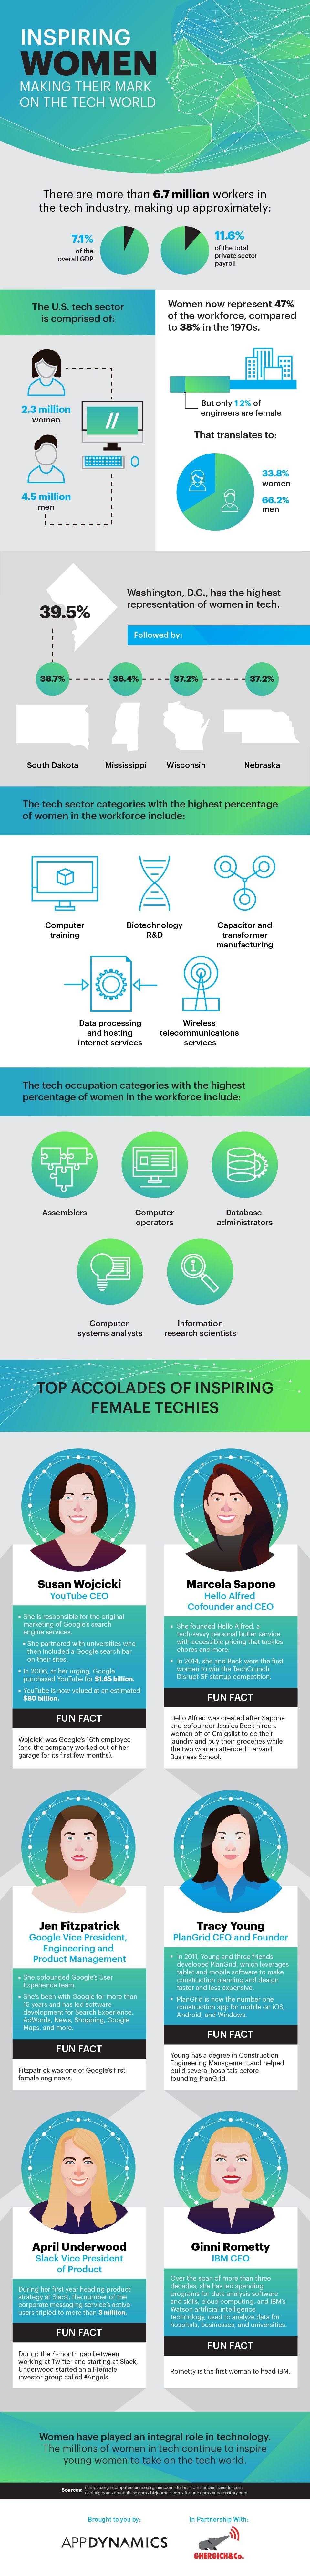 inspiring-women-making-their-mark-on-the-tech-world